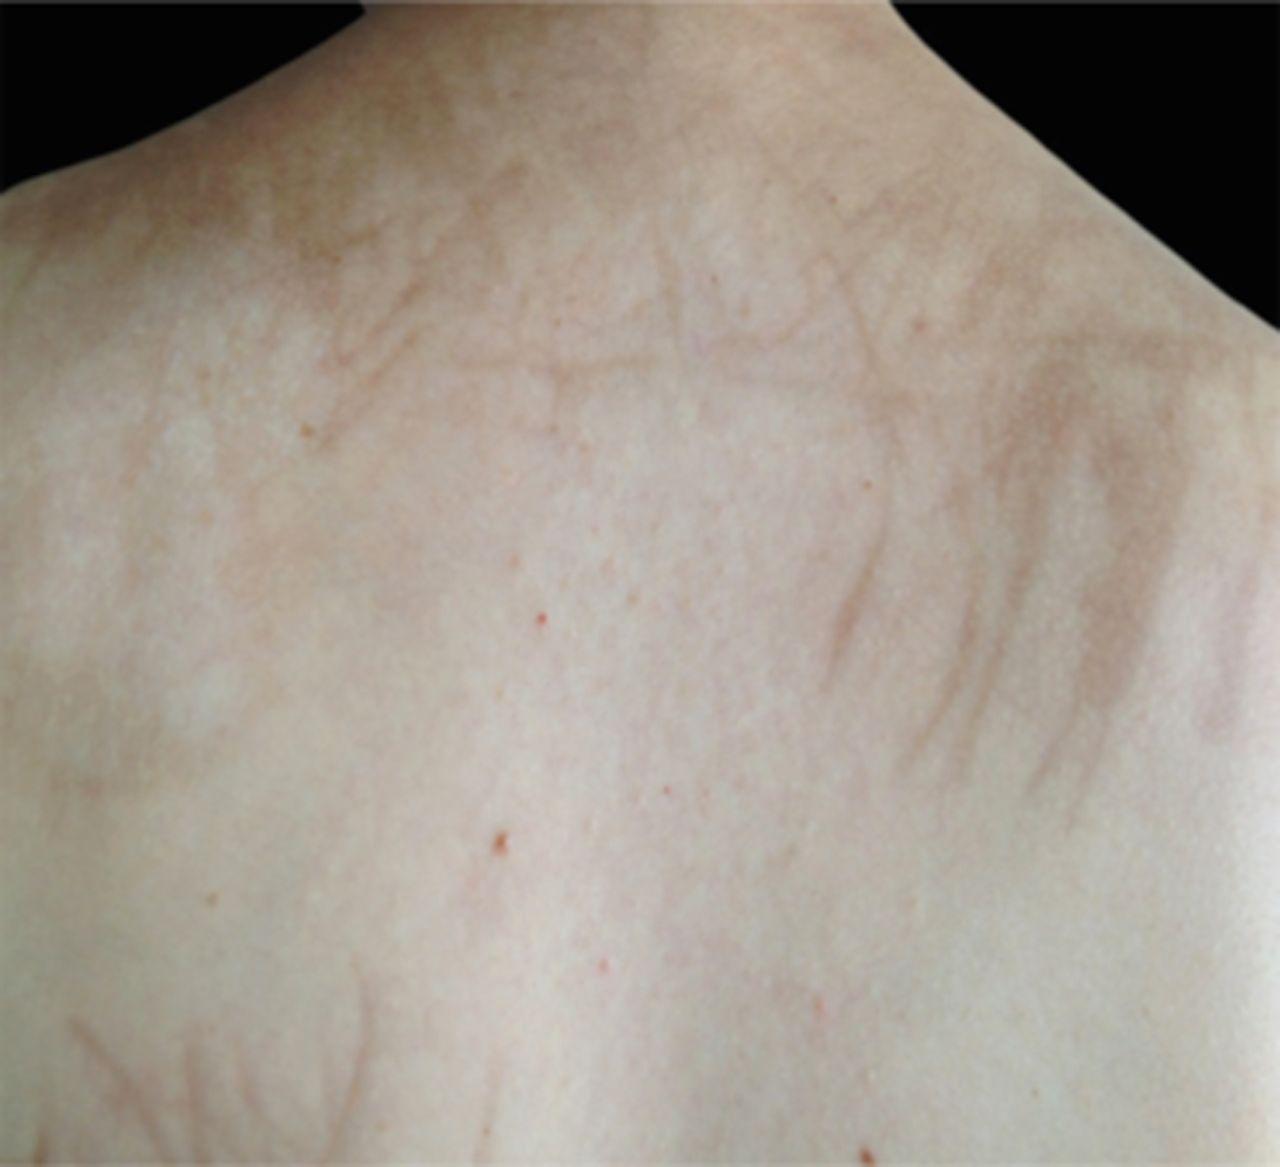 Bleomycin-induced flagellate hyperpigmentation | BMJ Case Reports